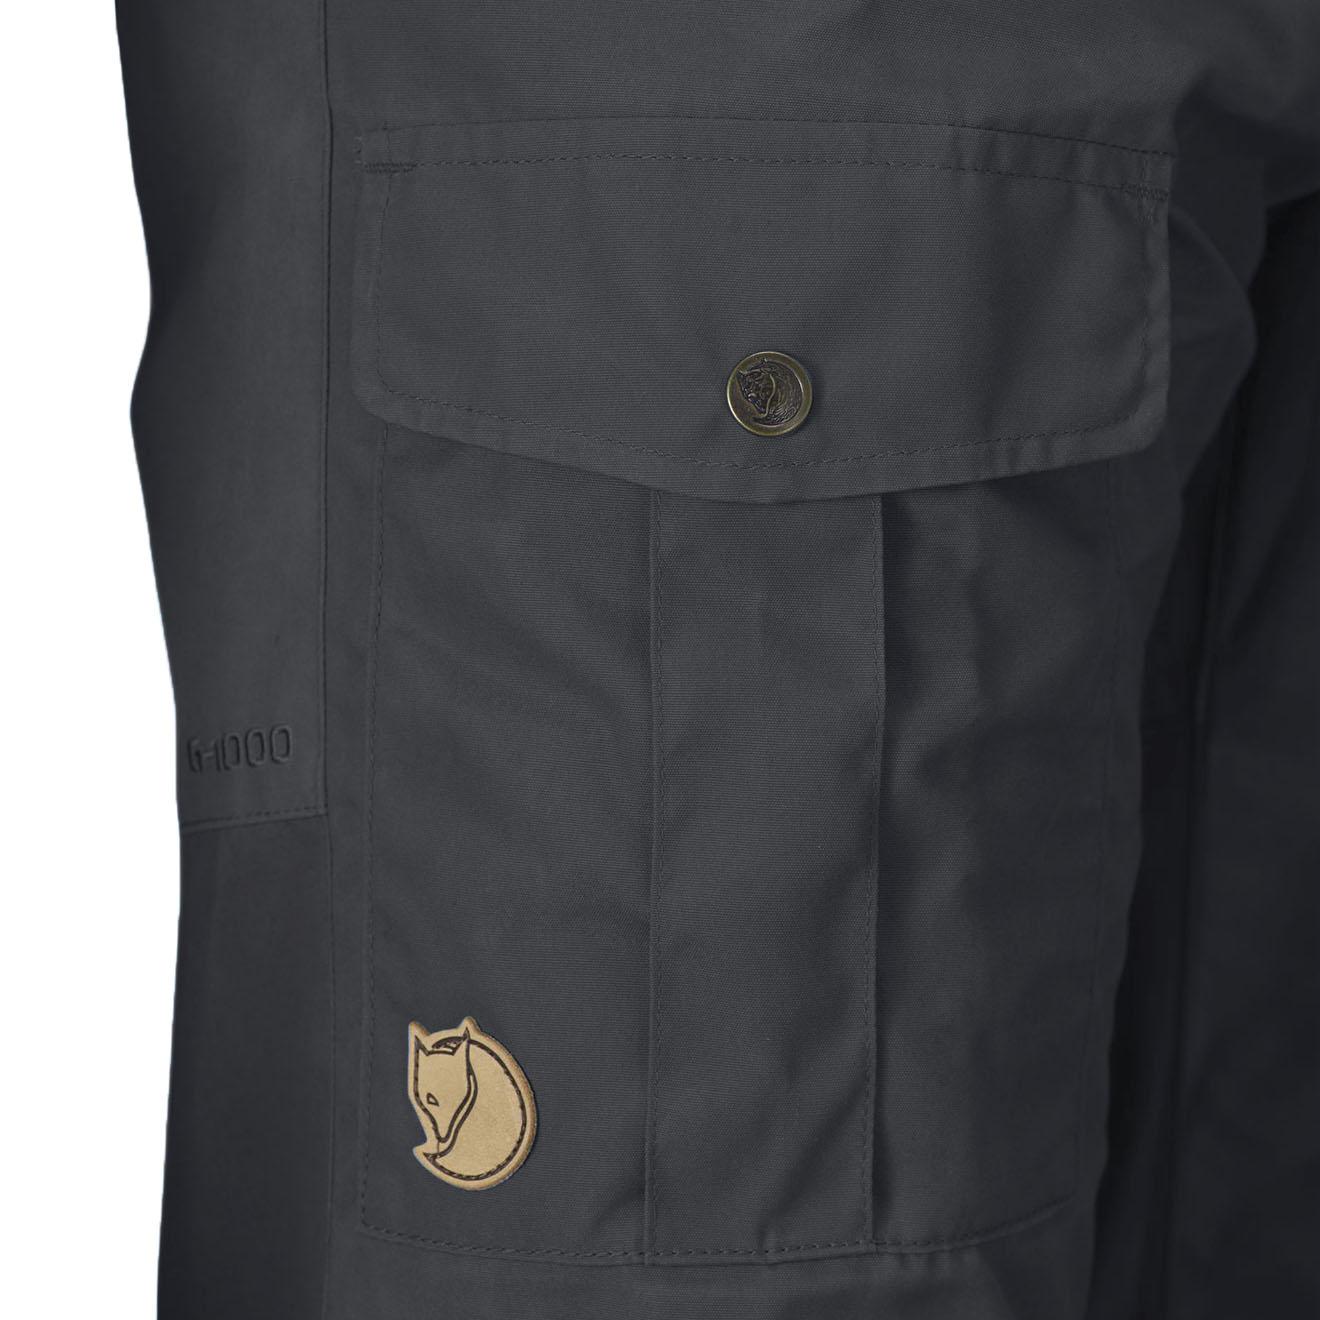 d9df690b Fjallraven Nils Trousers Regular Dark Grey - The Sporting Lodge